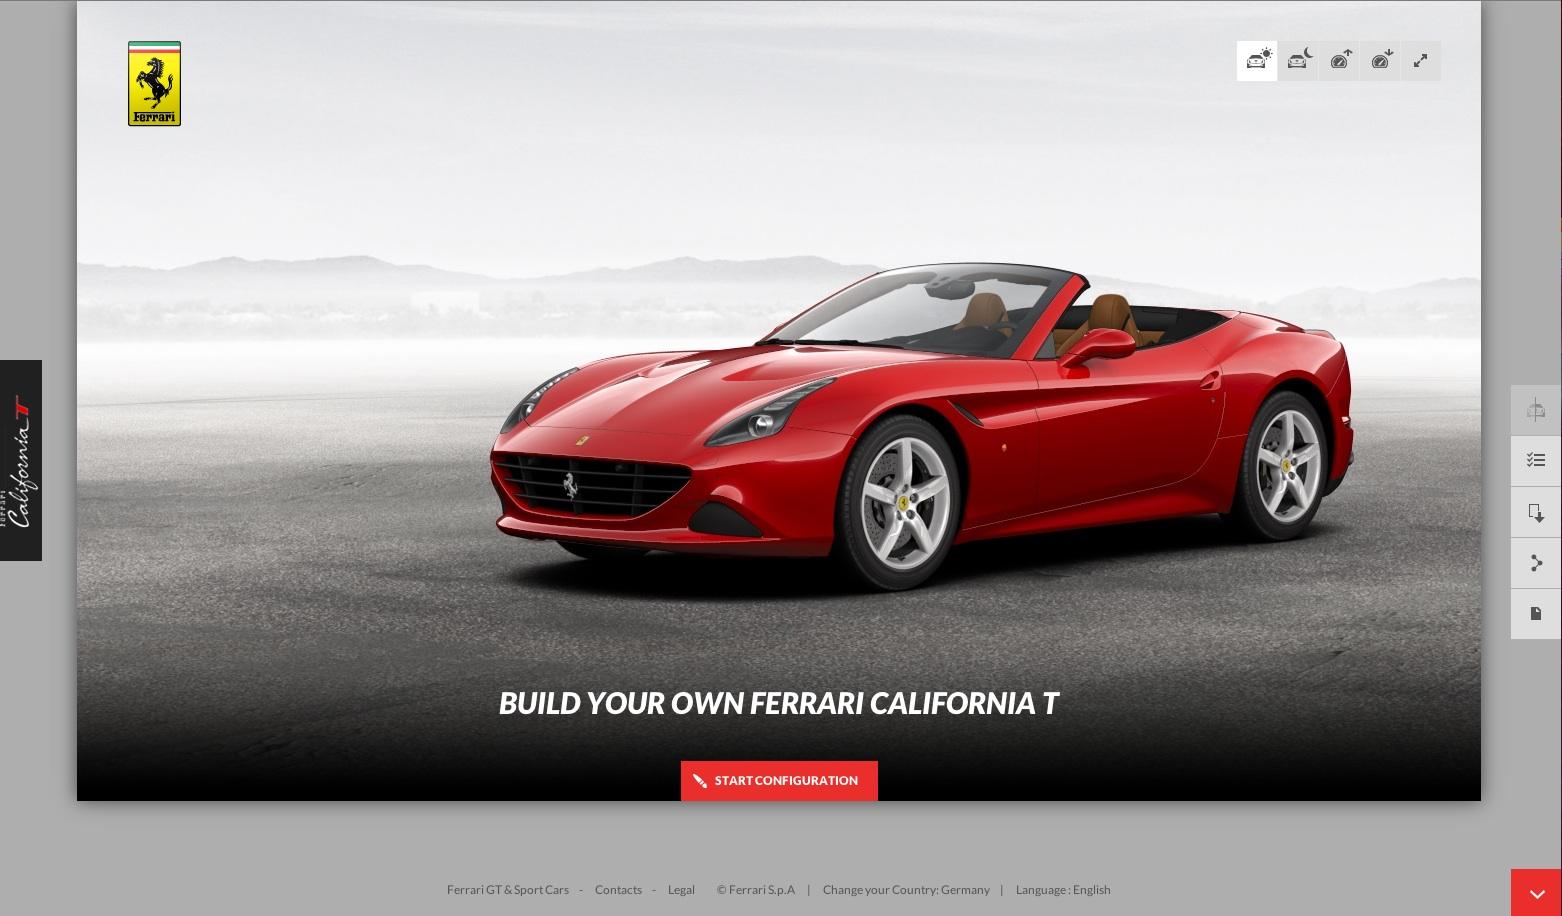 California T online configuration tool